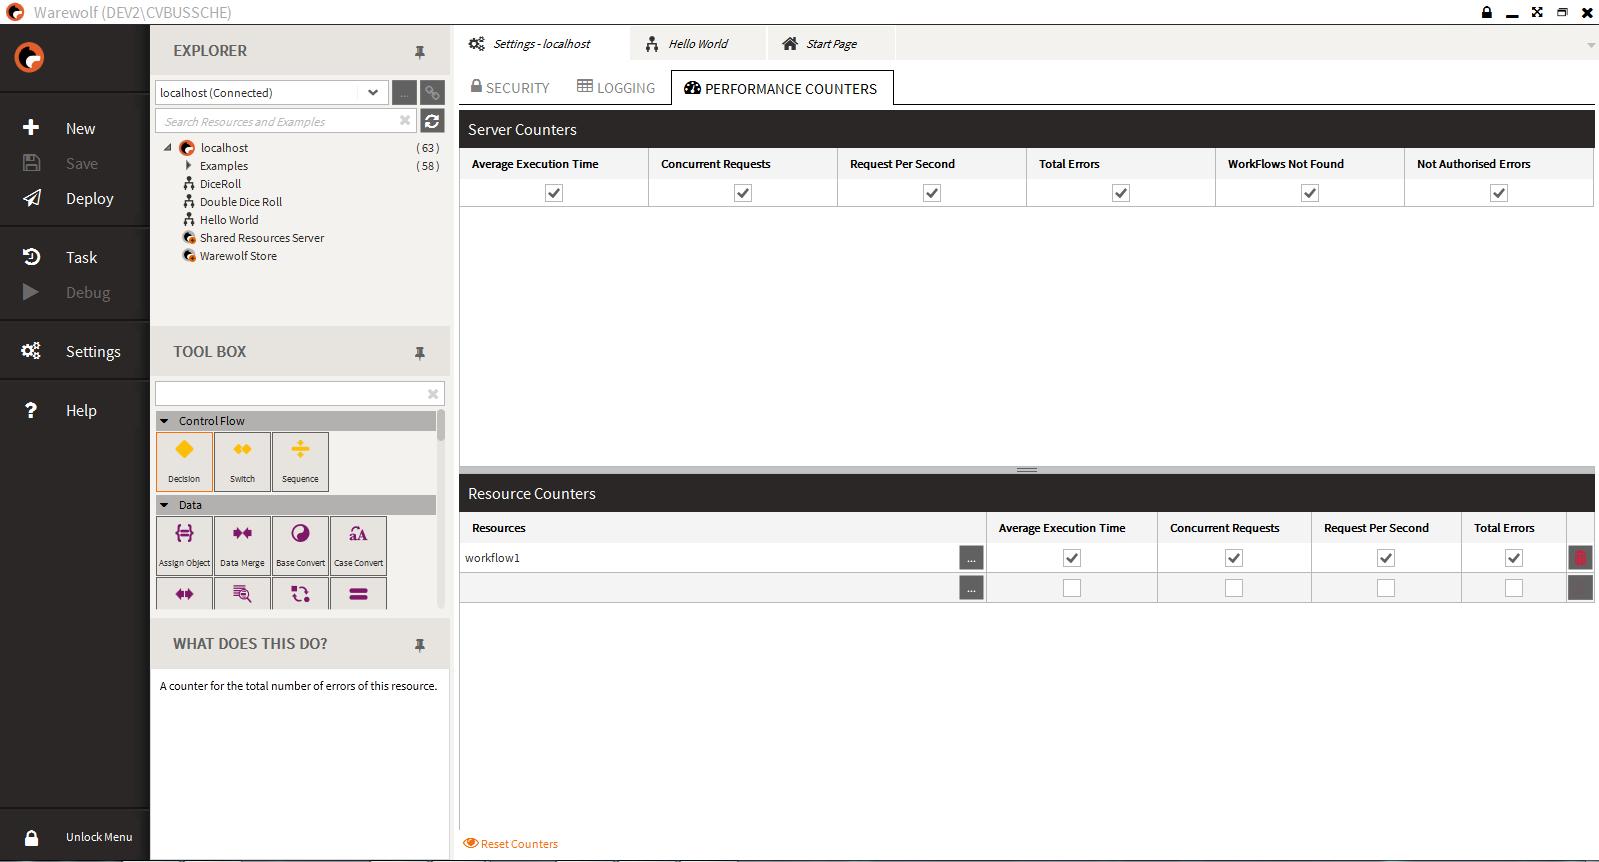 Screenshot of the Warewolf Studio Performance Counters